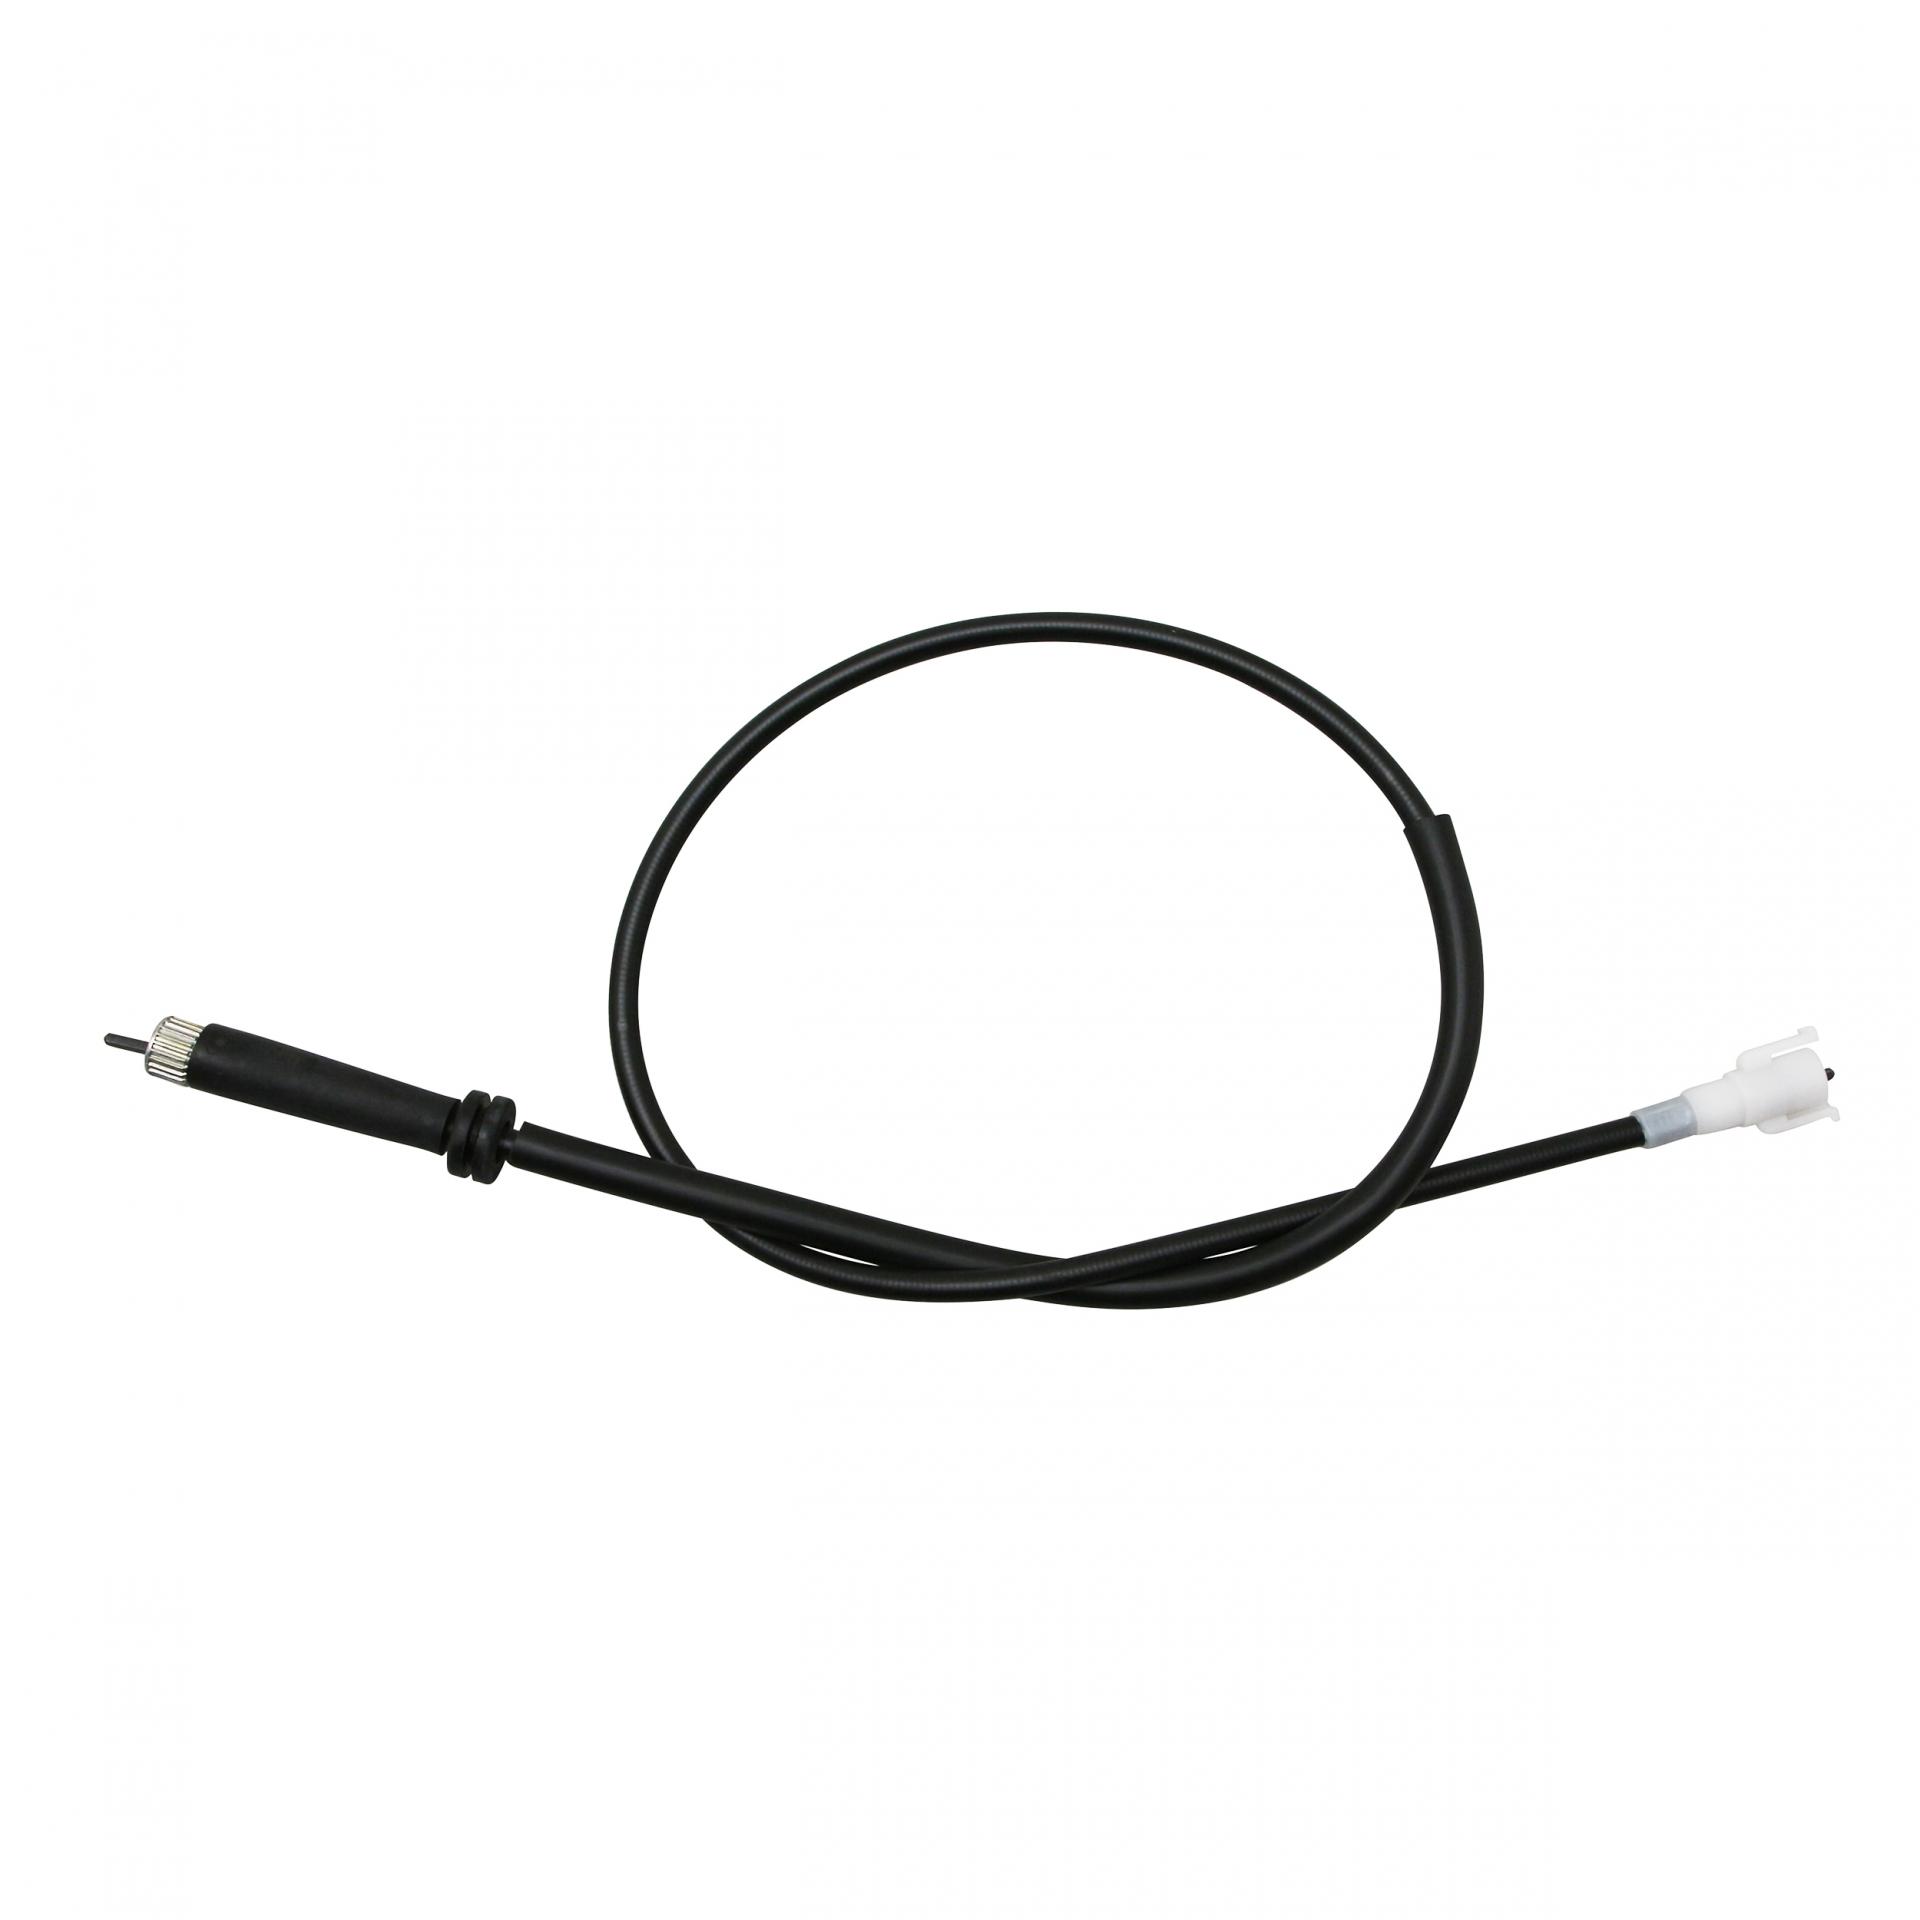 Câble de compteur Piaggio 50 ZIP RST 96-99